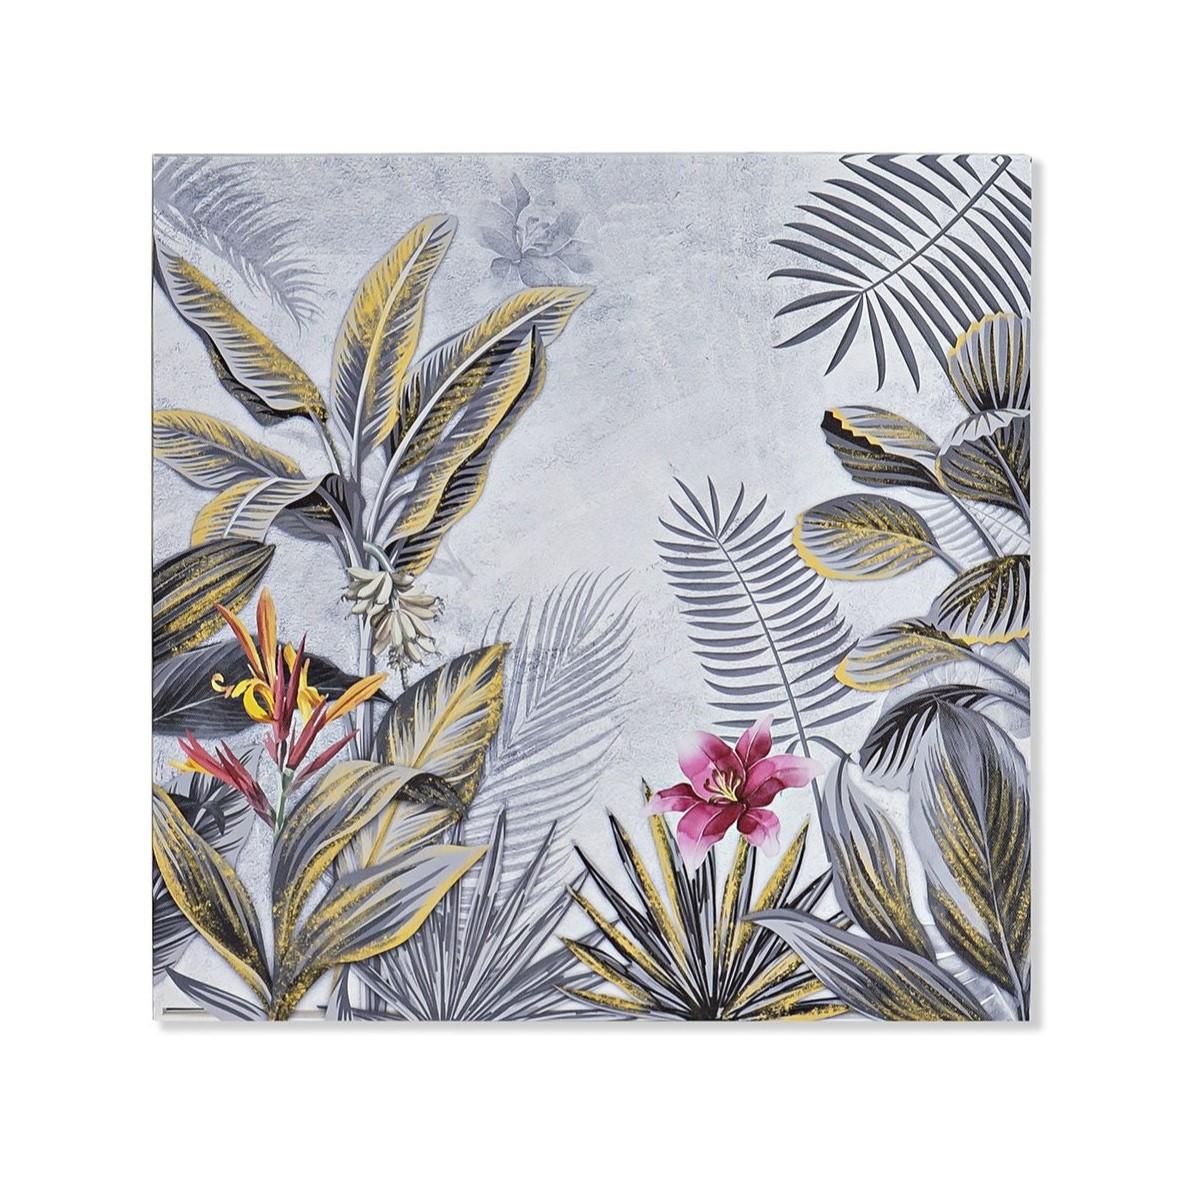 31665-lienzo-plantas-tropical-40-x-40.jpg